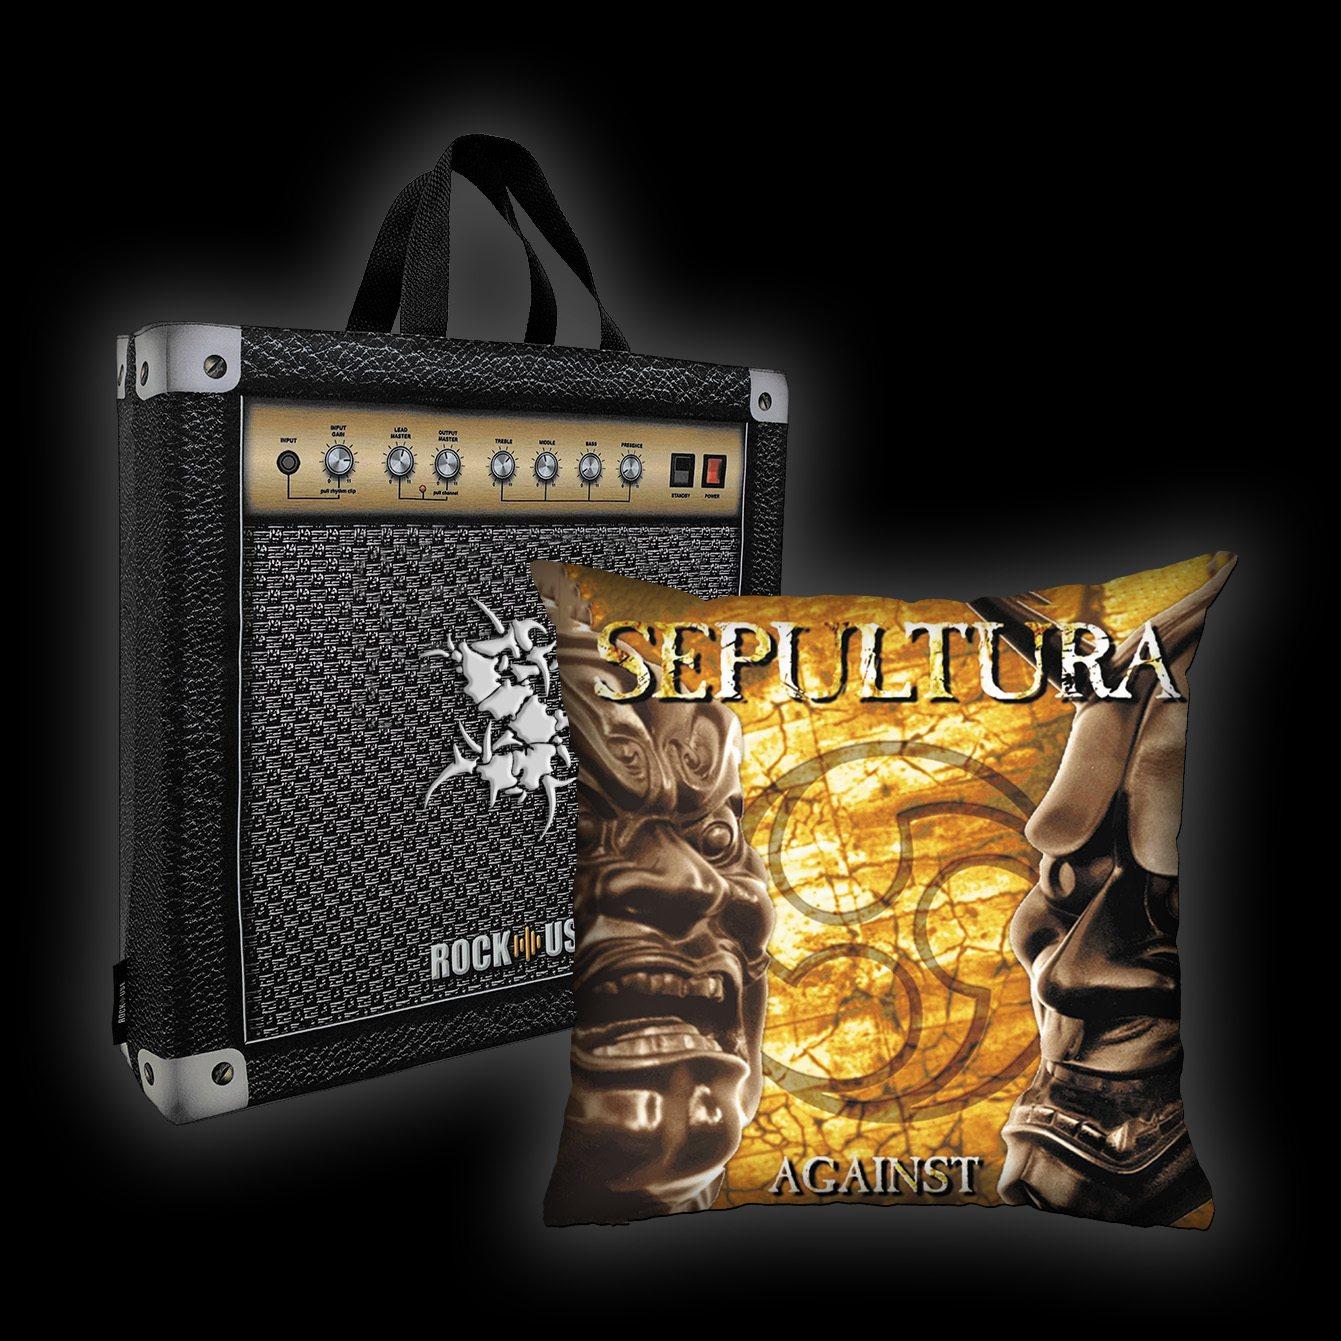 Kit Almofada & Sacola Sepultura - Against